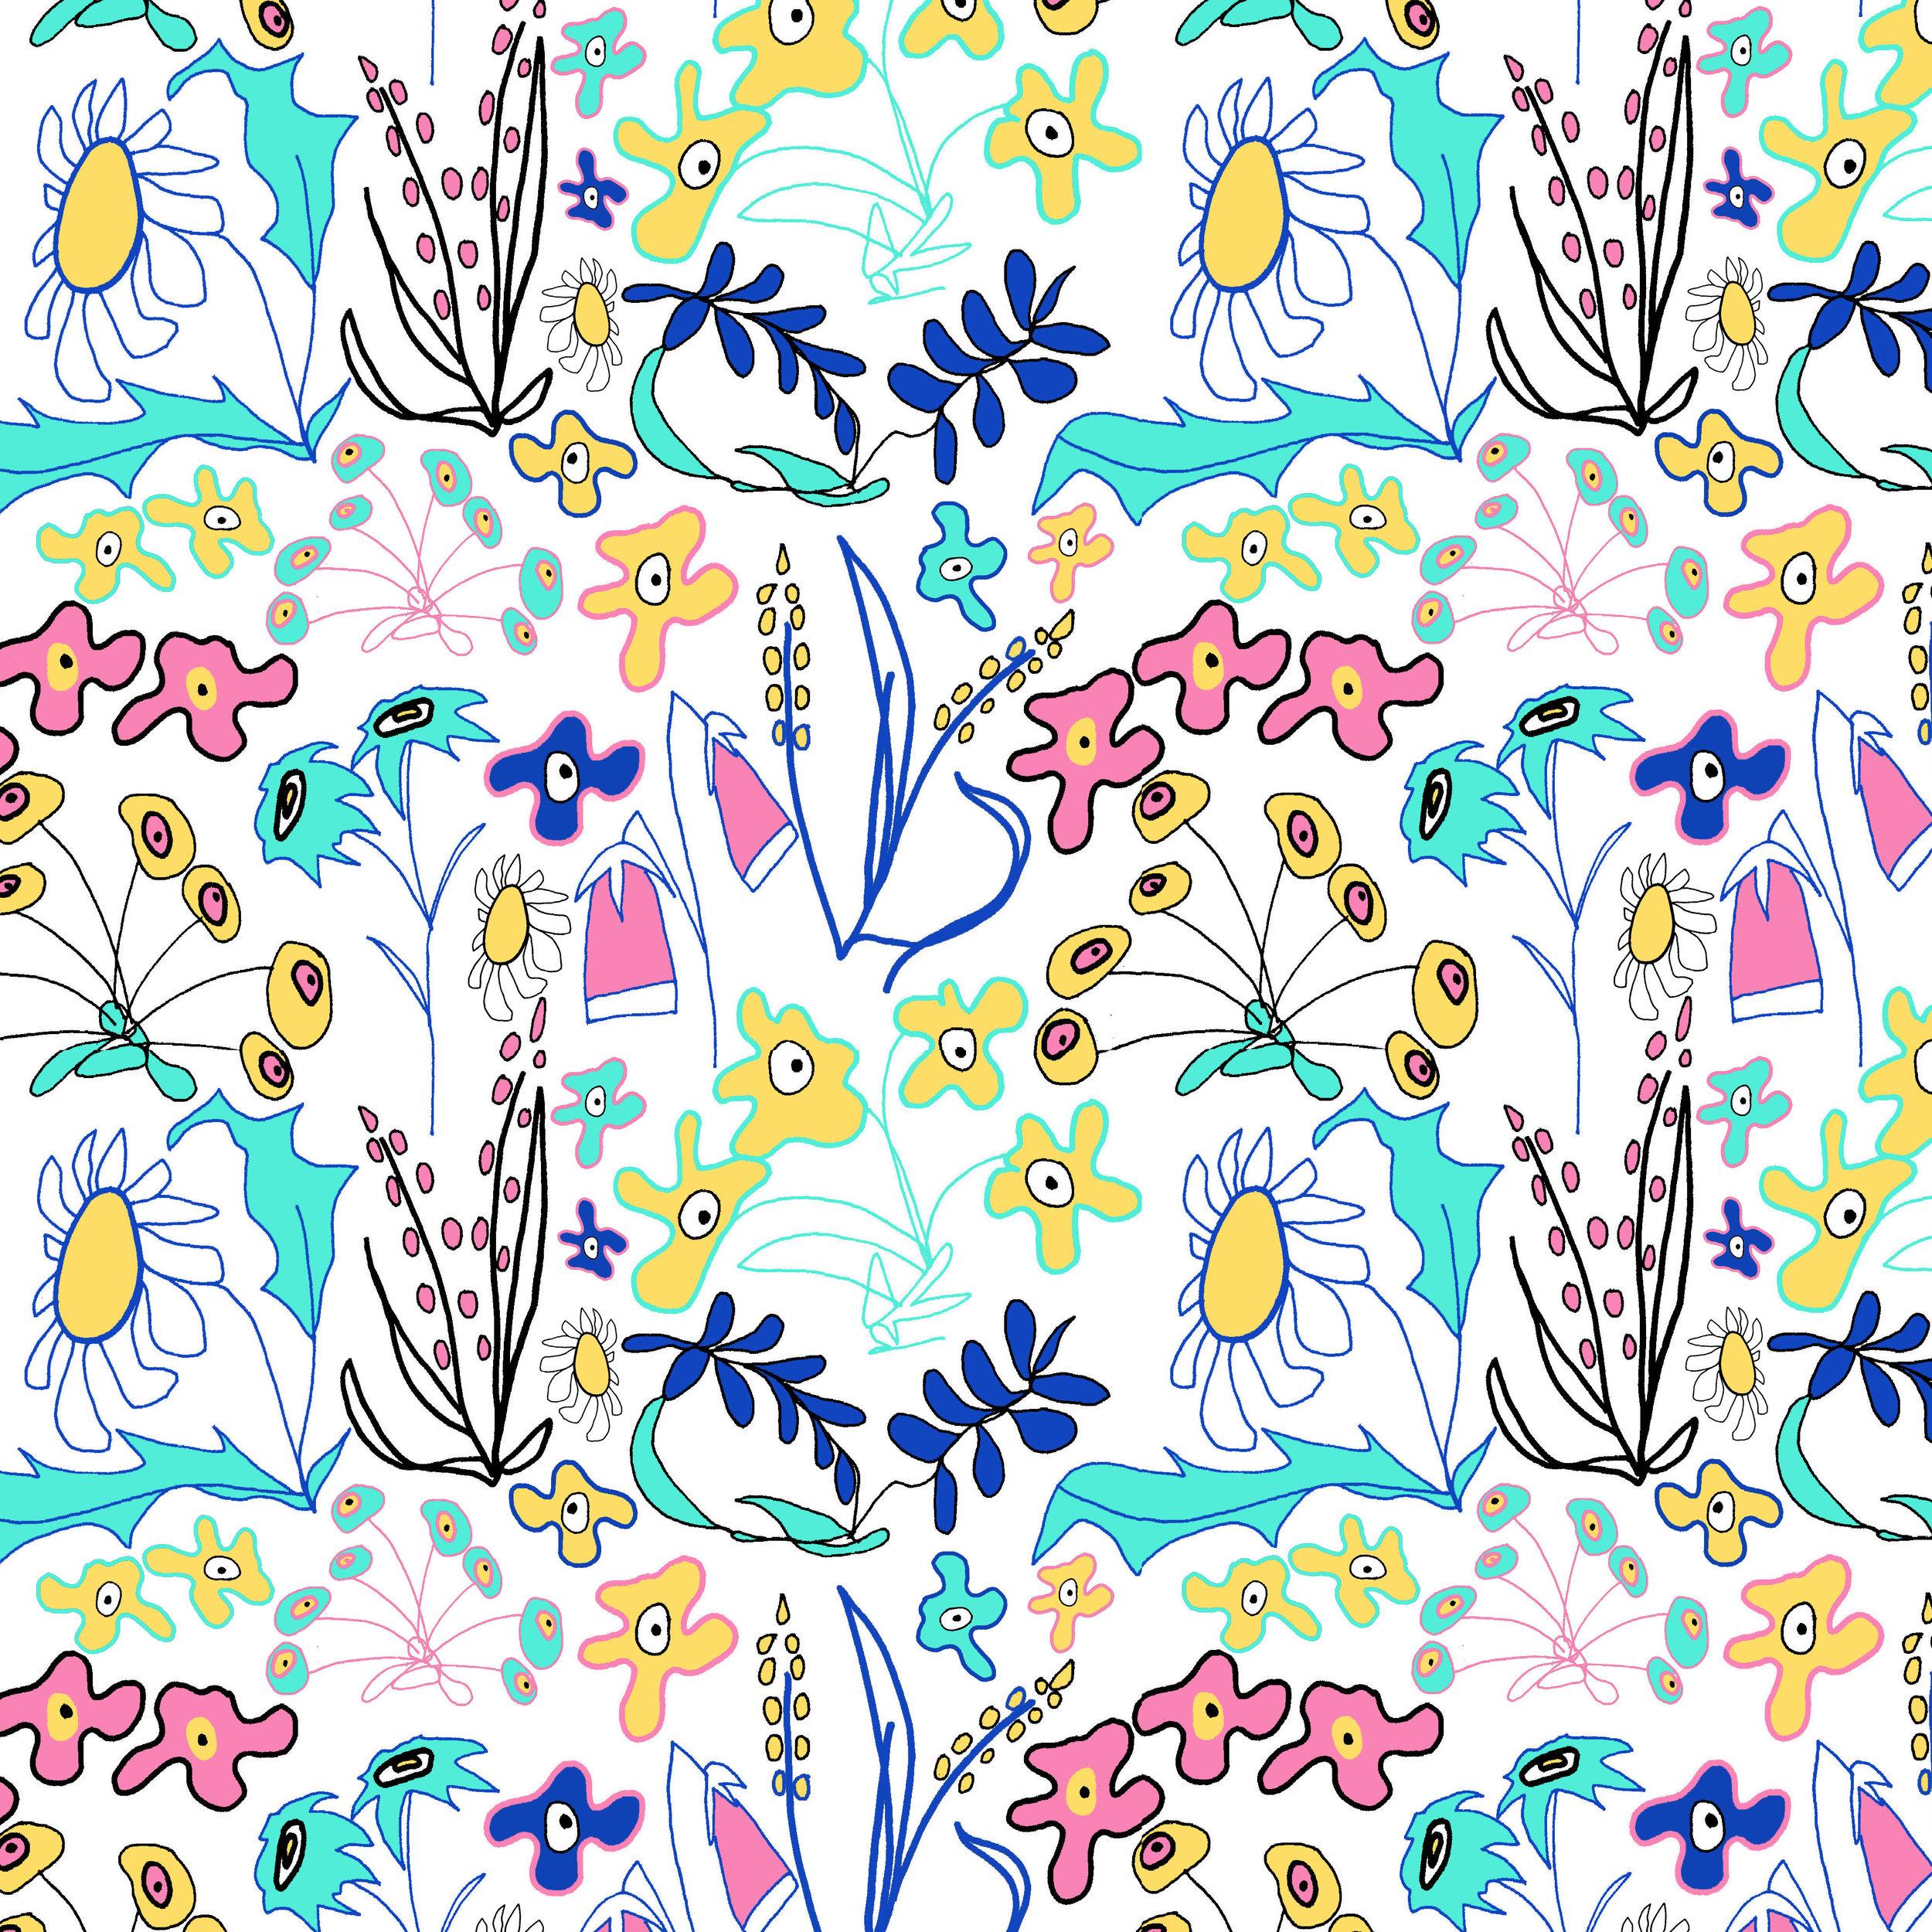 Tapestry Flowers Repeat.jpeg